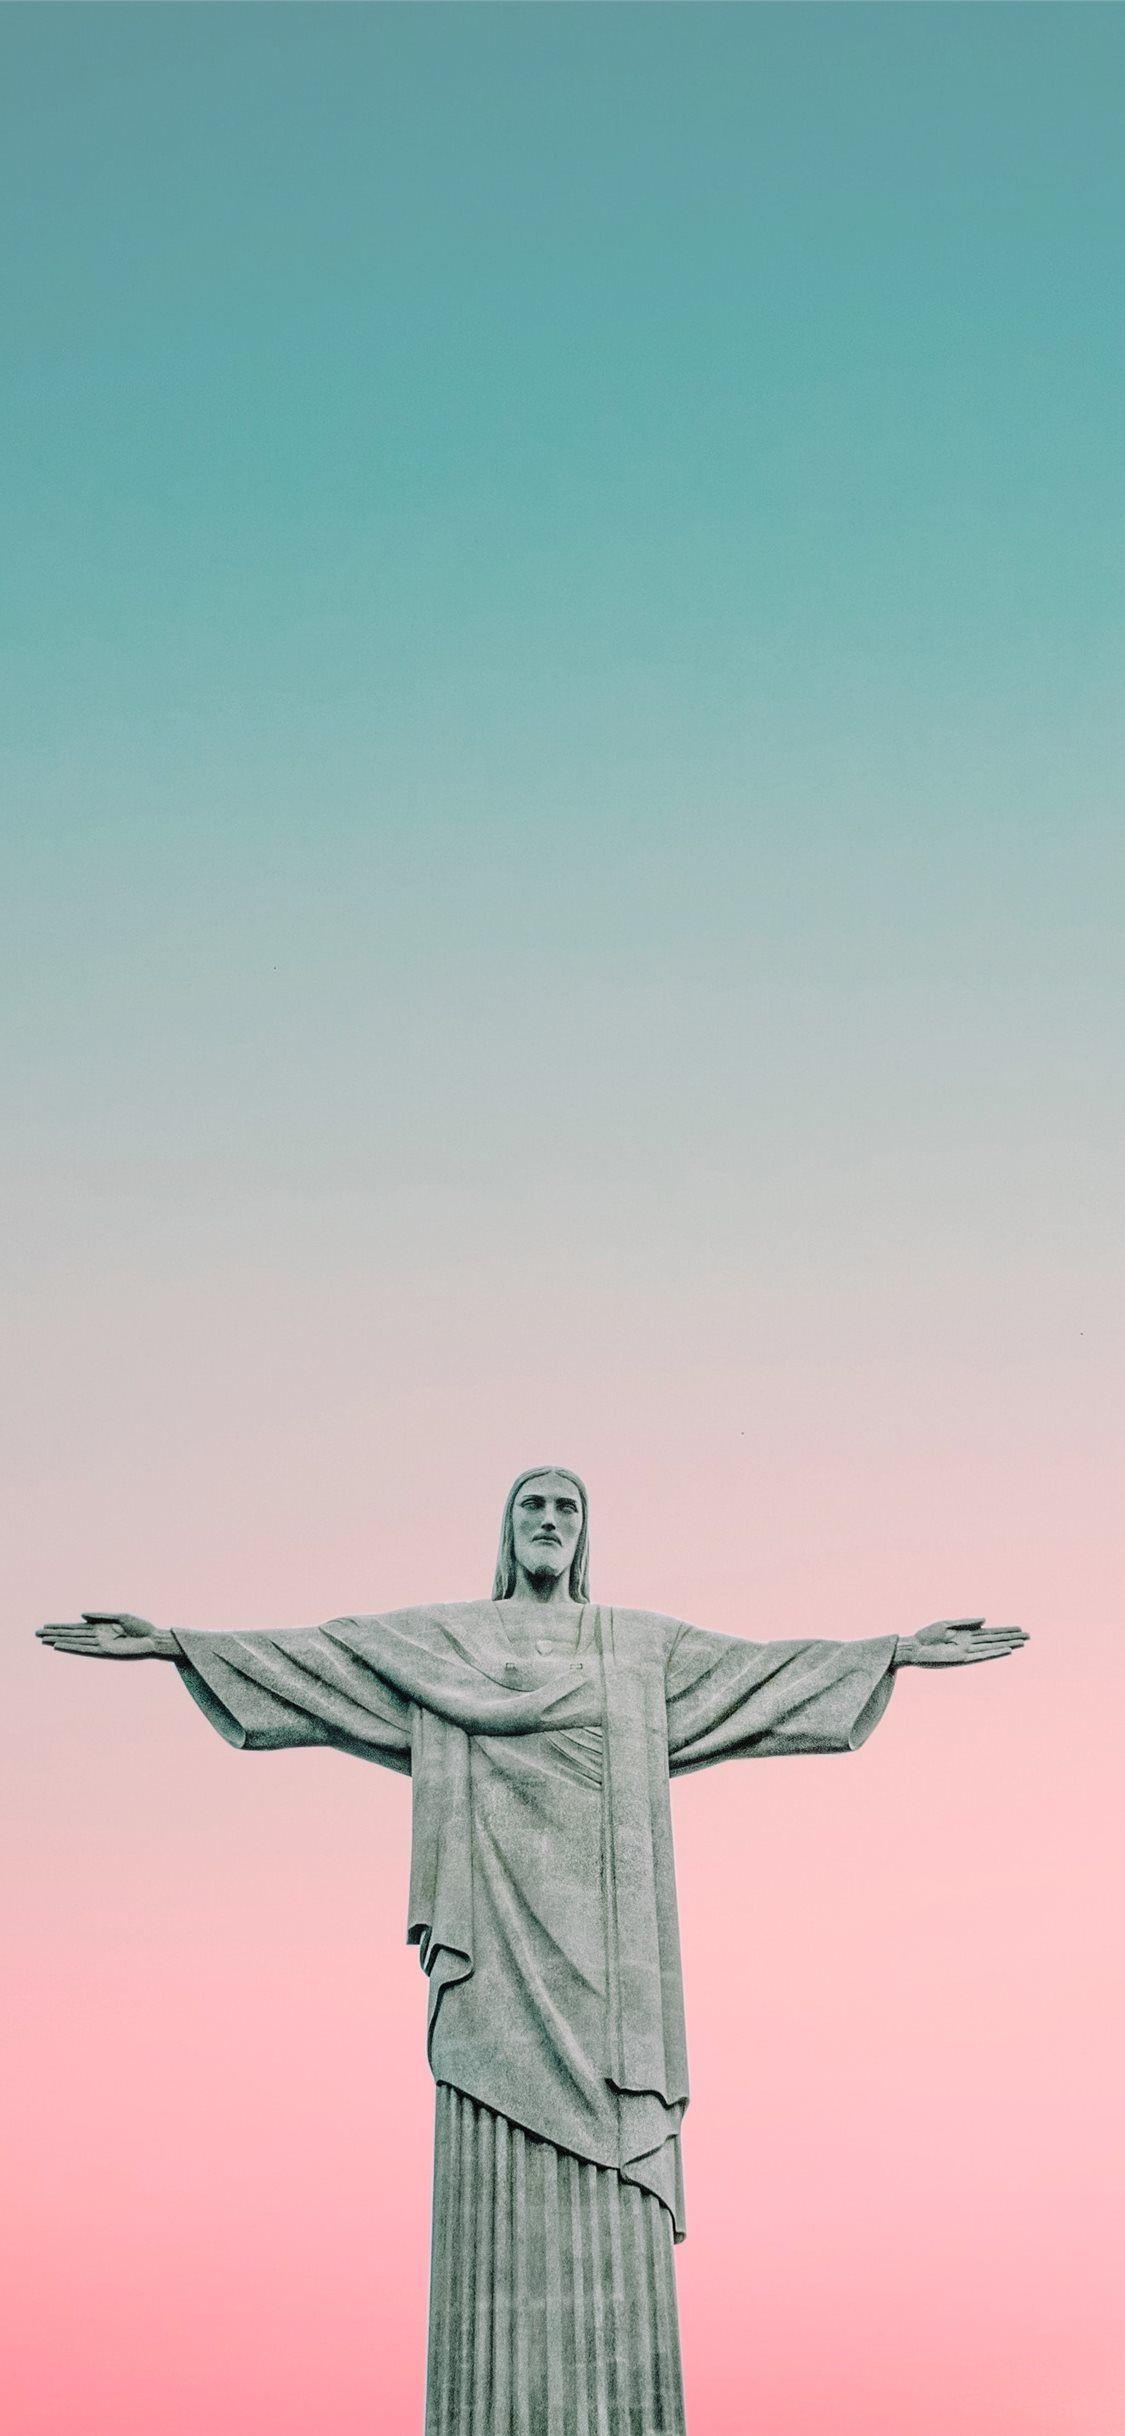 Rio De Janeiro Brazil Rio Brazil Brazil Cool Wallpapers For Phones